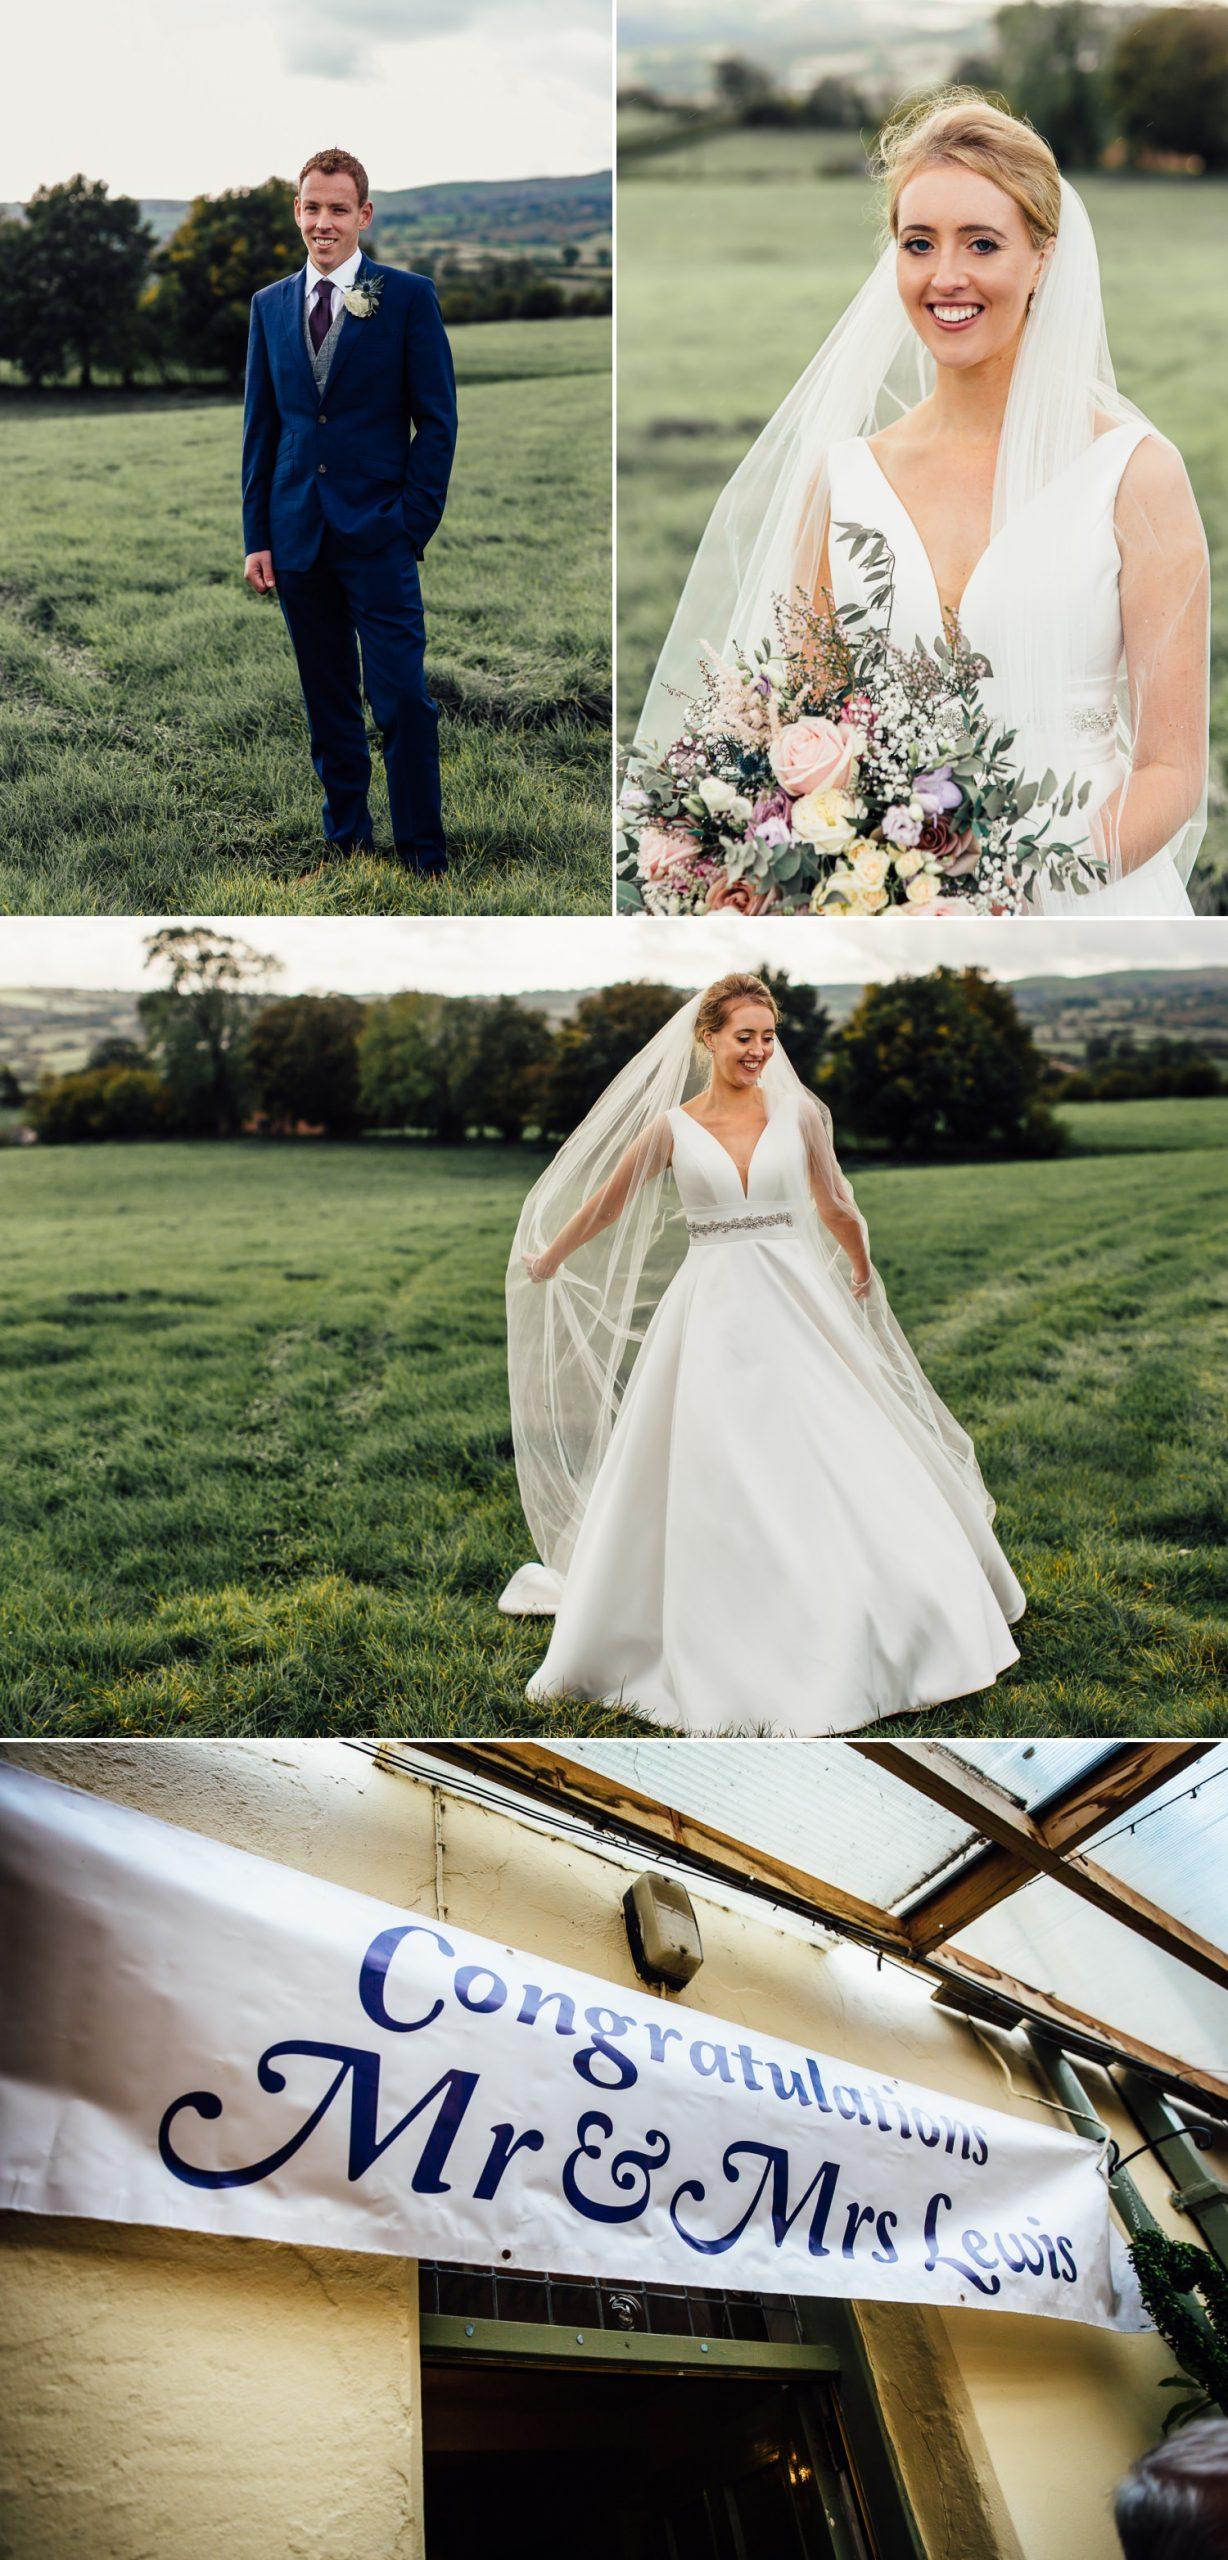 wedding photography portraits of bride and groom